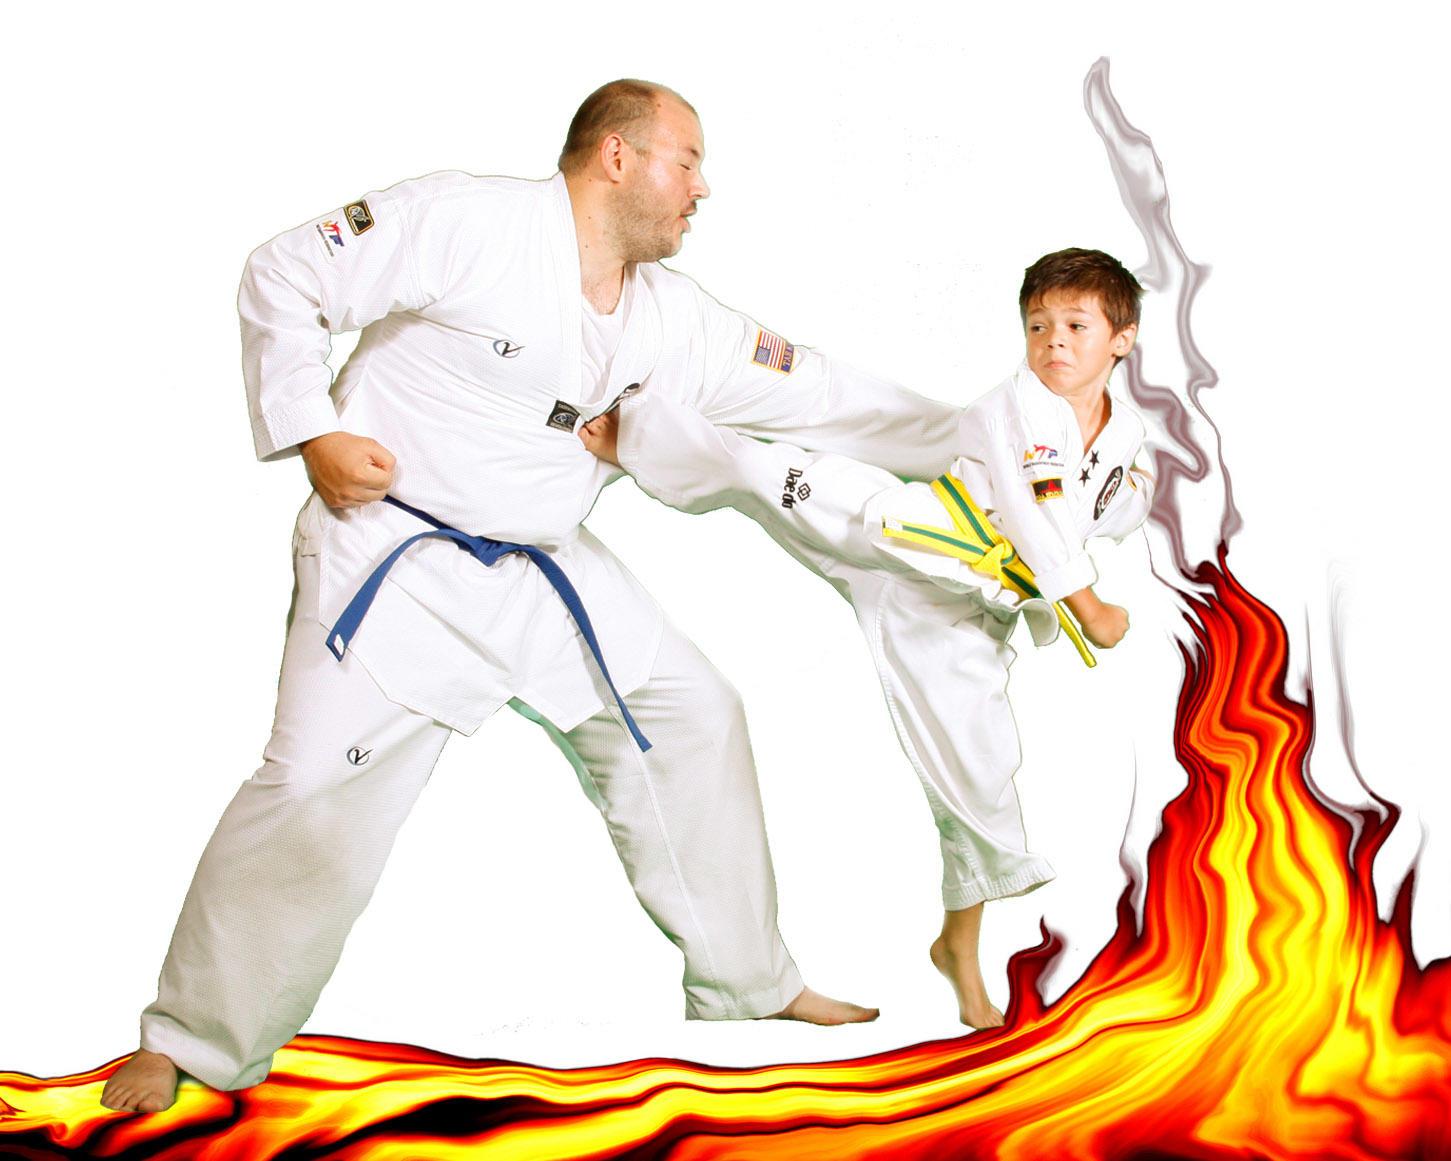 Millennium Martial Arts - Tae Kwon Do image 18